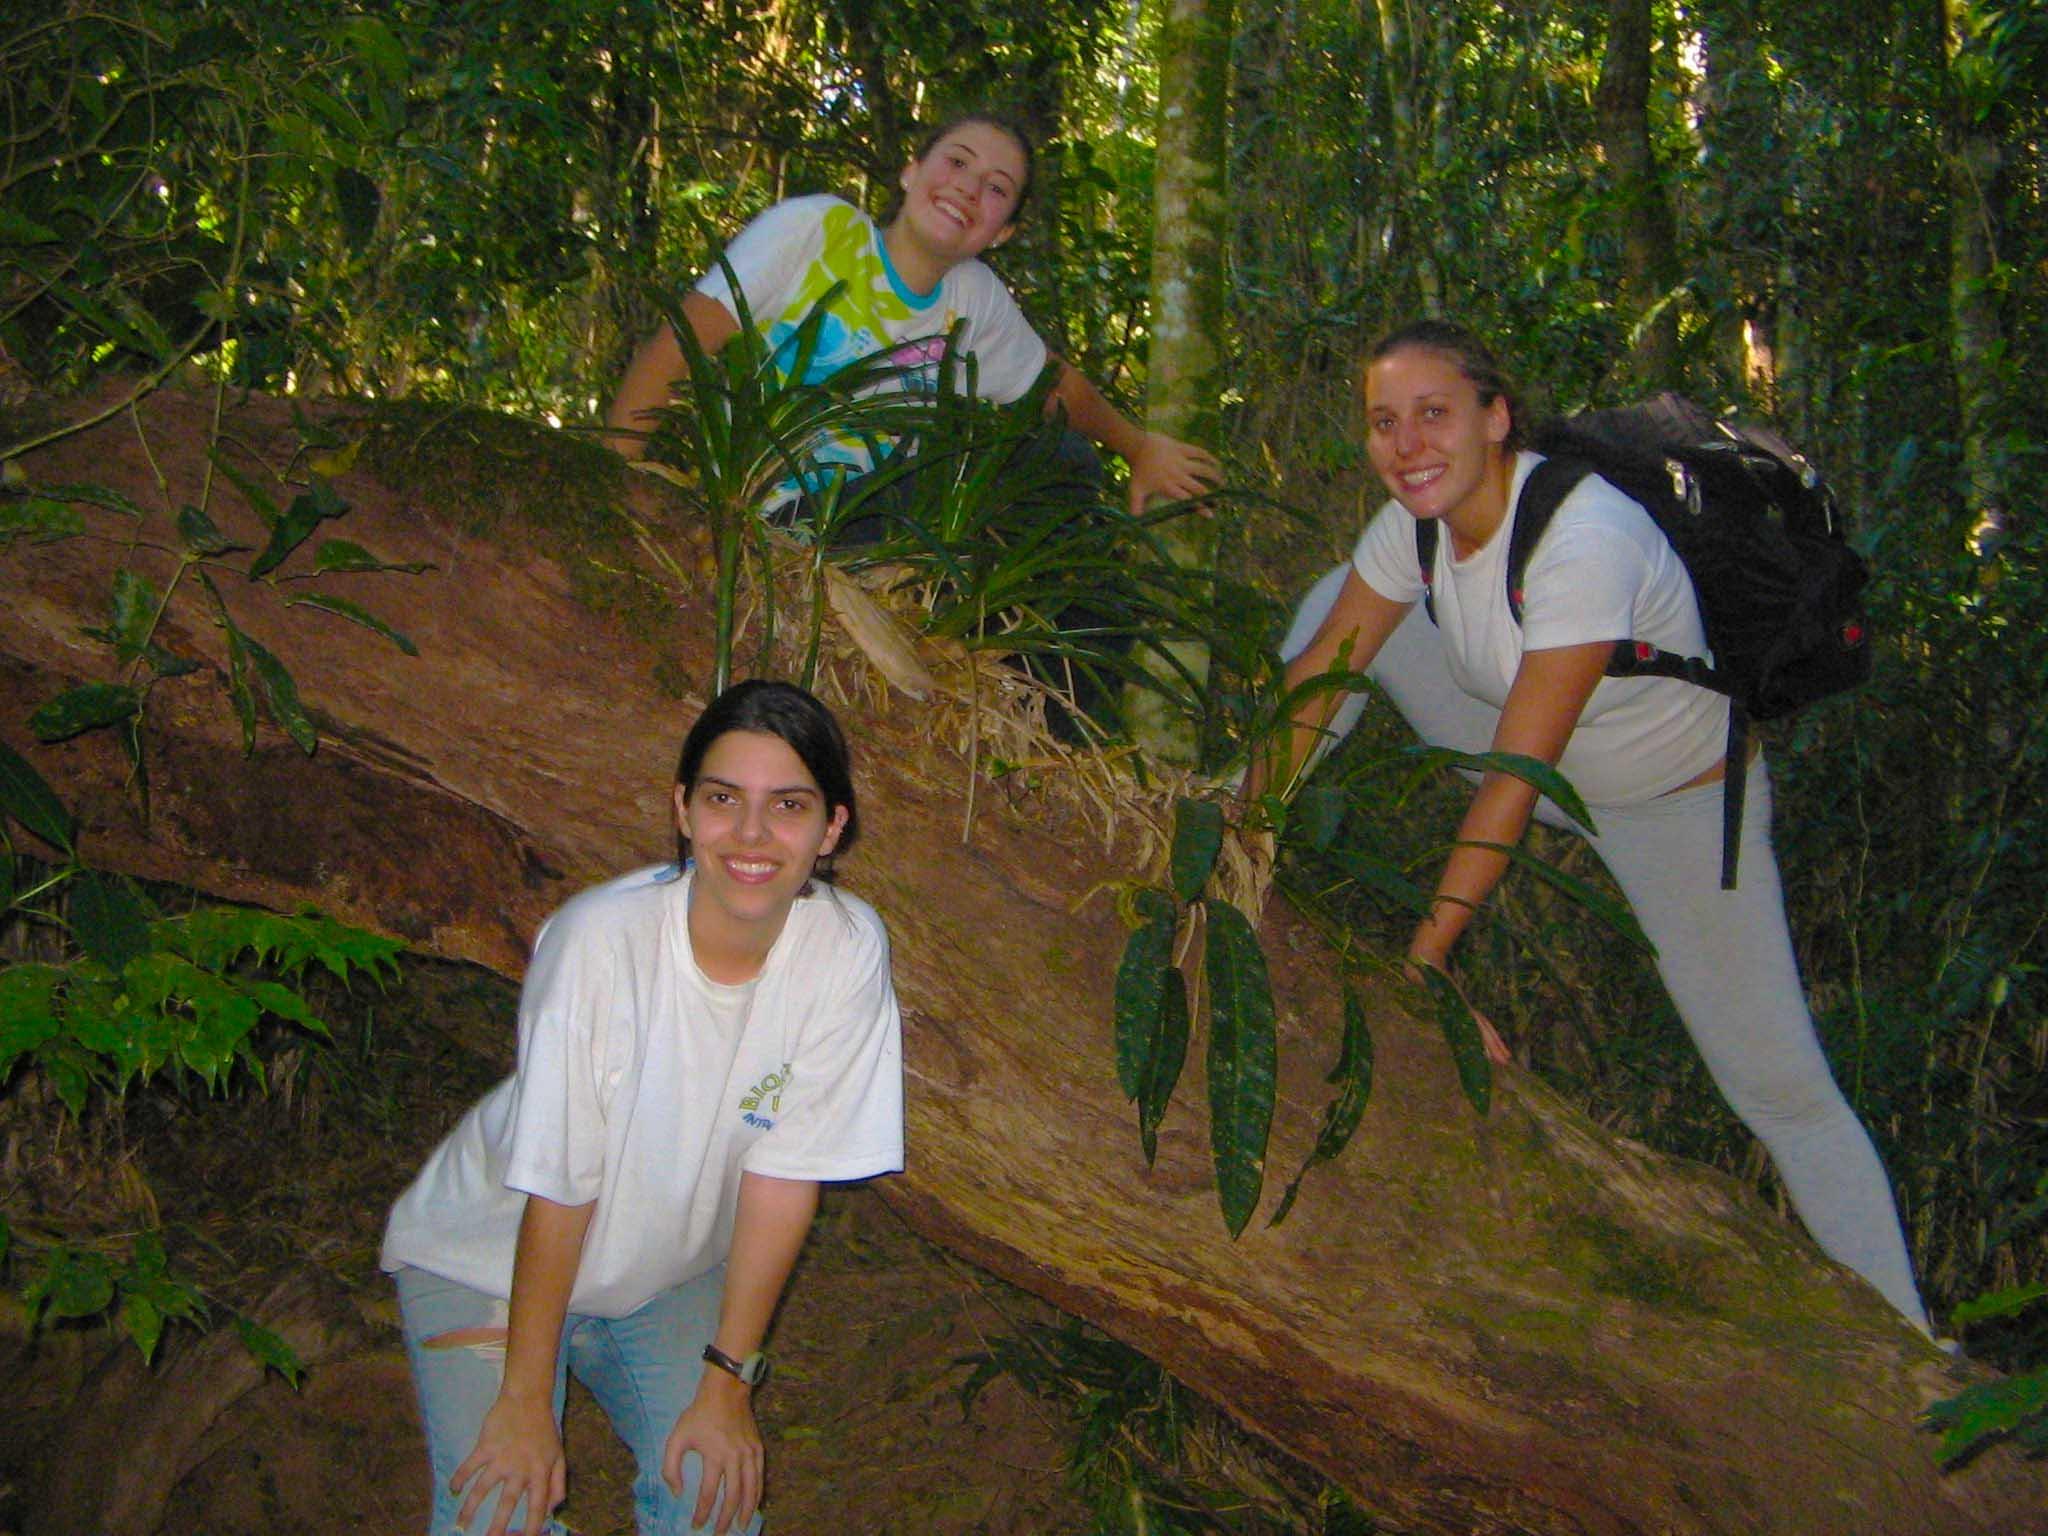 Obstáculos na trilha do Pico do Baepi